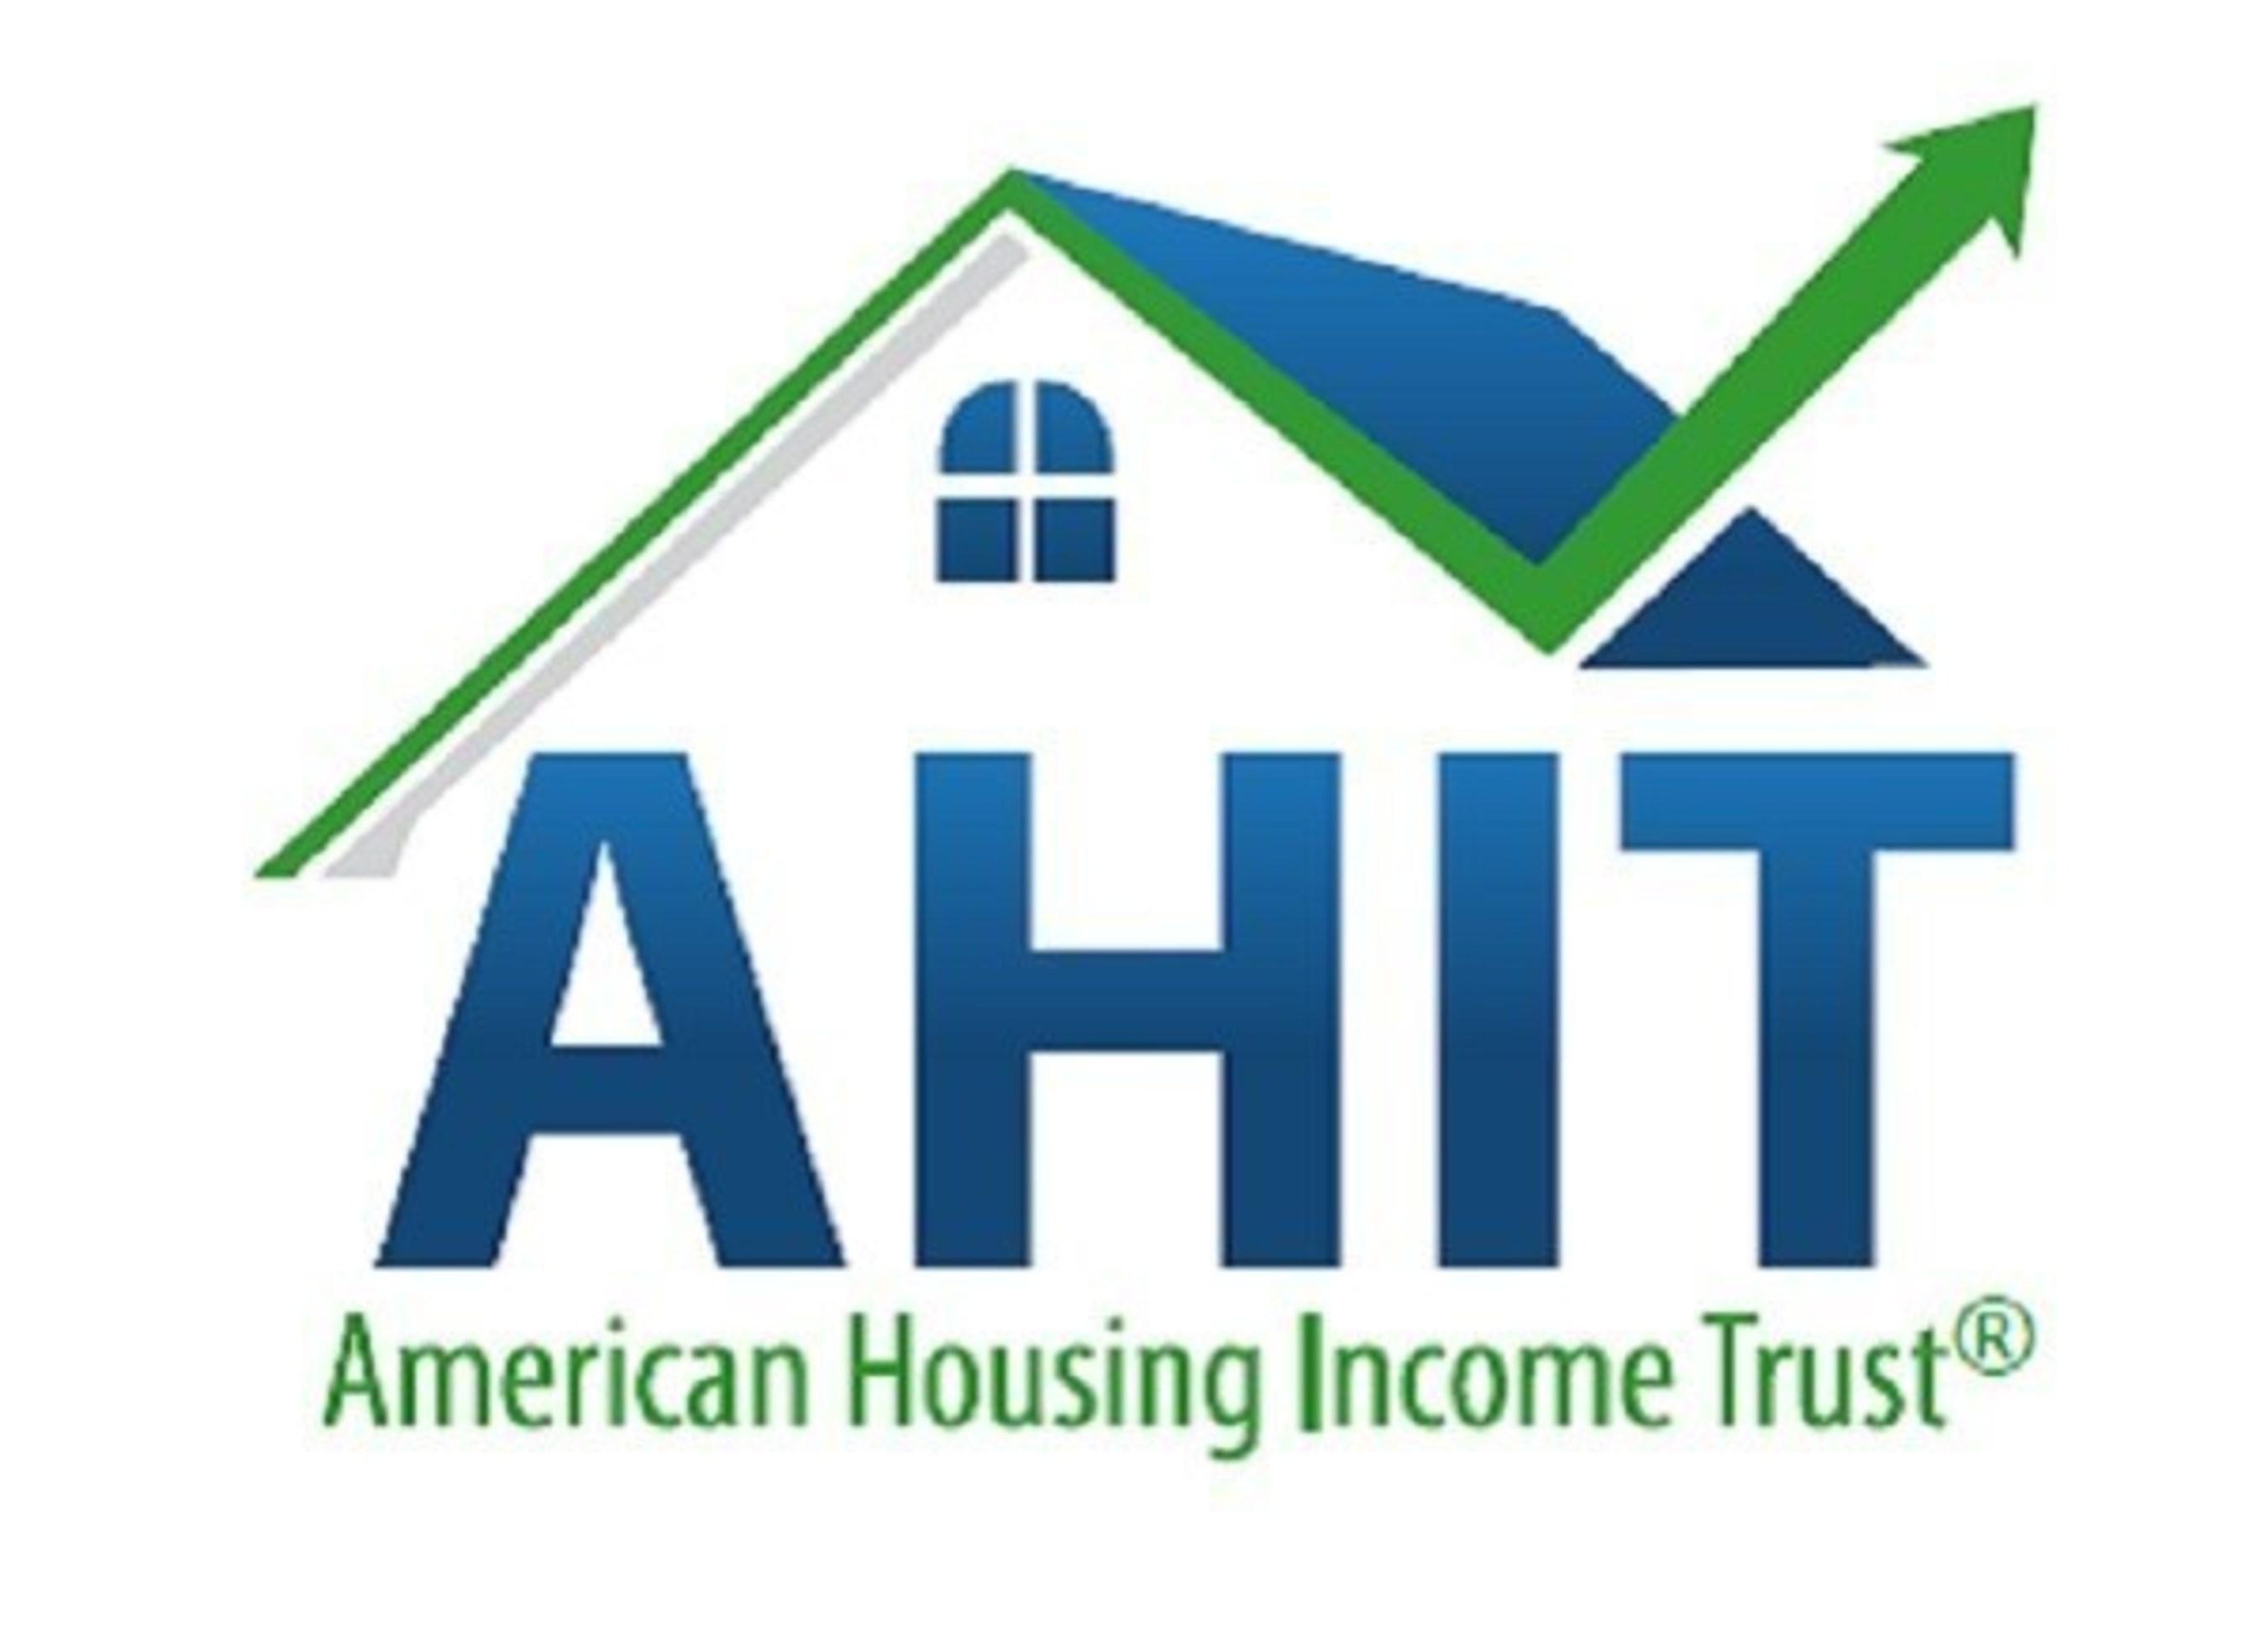 American Housing Income Trust (PRNewsFoto/American Housing Income Trust)